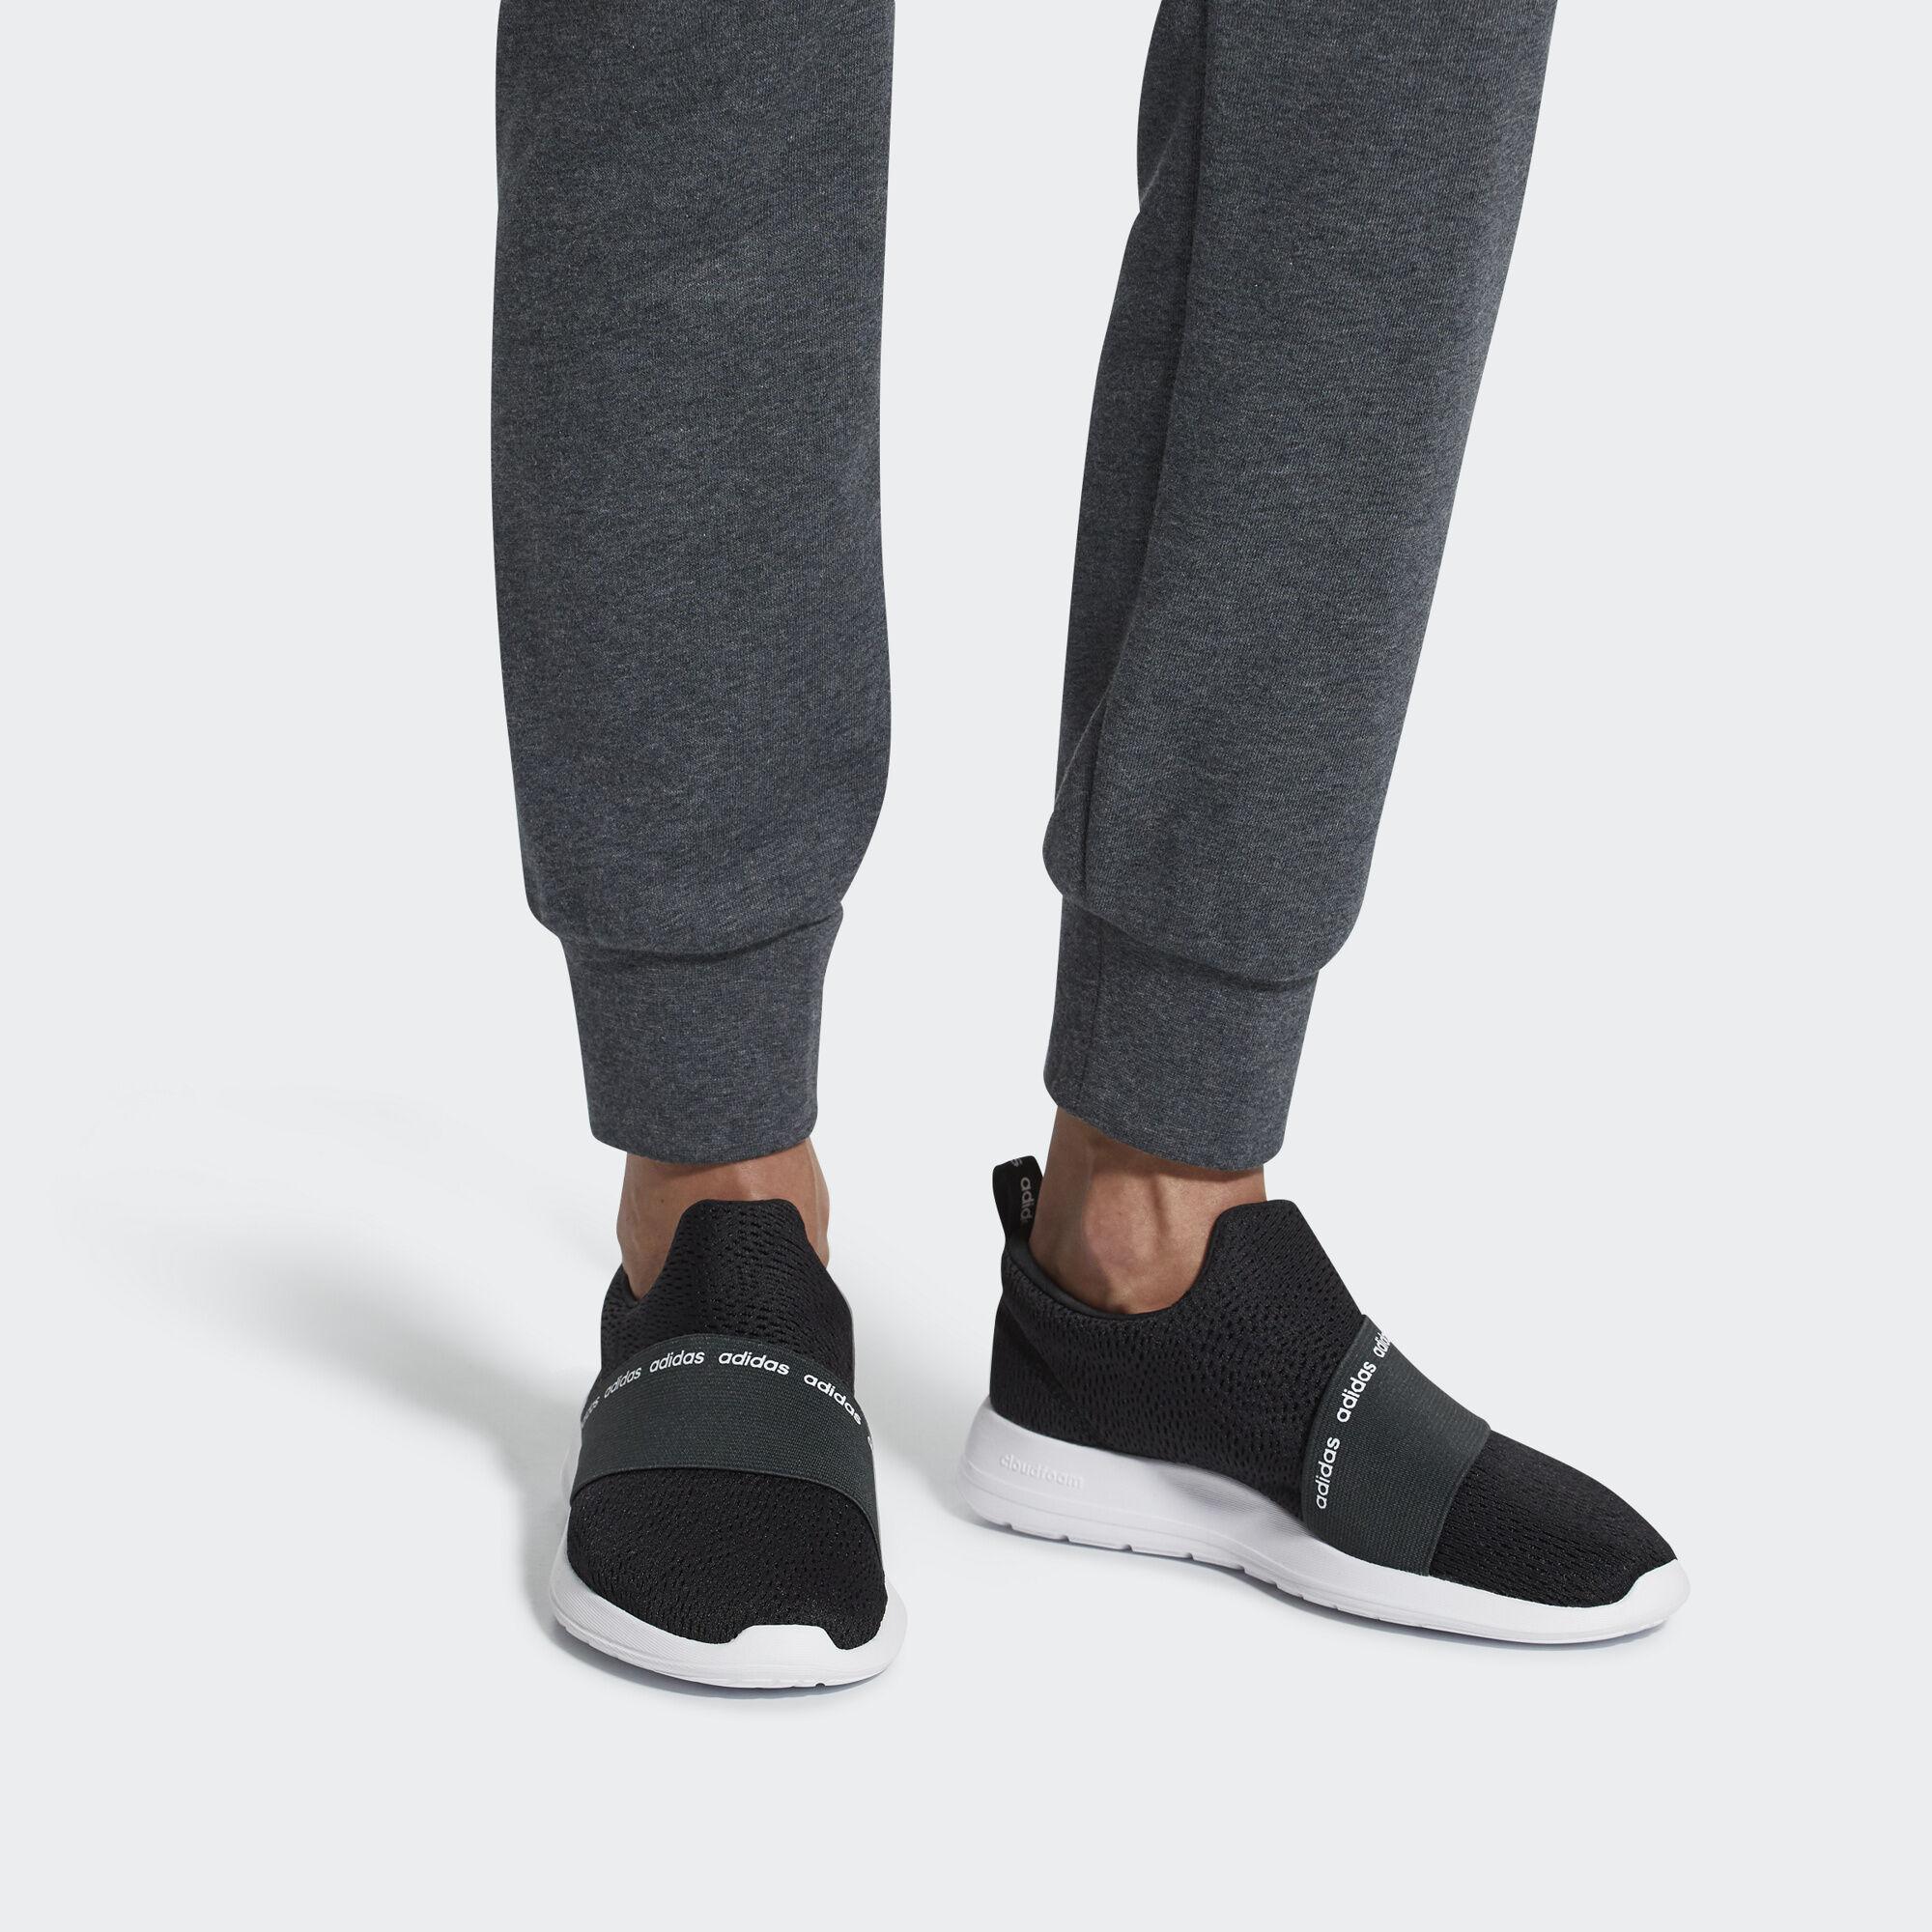 aca8a3f1dd75de adidas Cloudfoam Refine Adapt Shoes - White